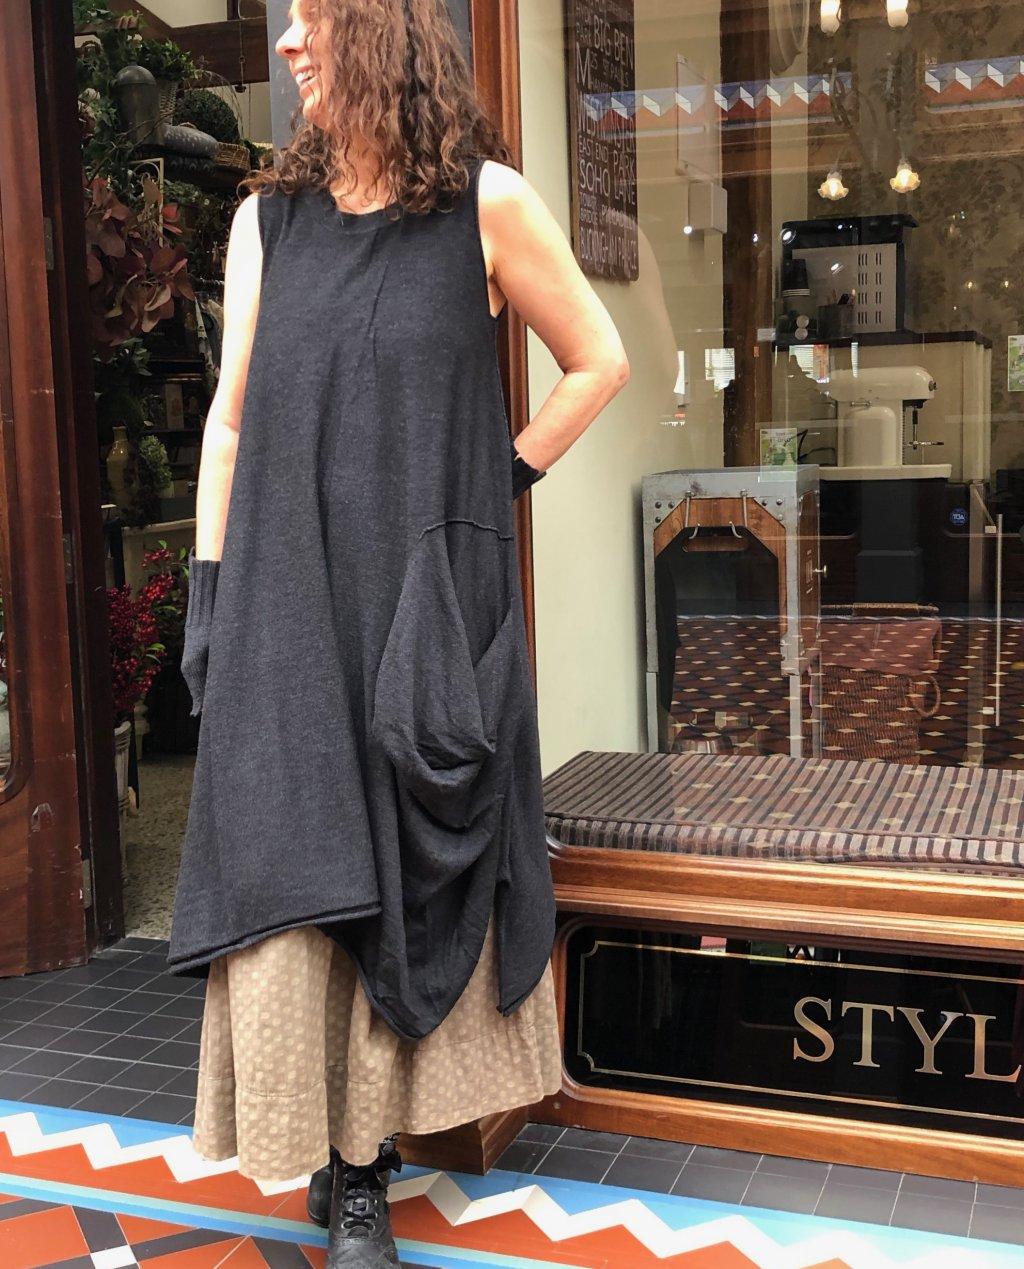 Banana Blue - Merino Dress - Dark Charcoal